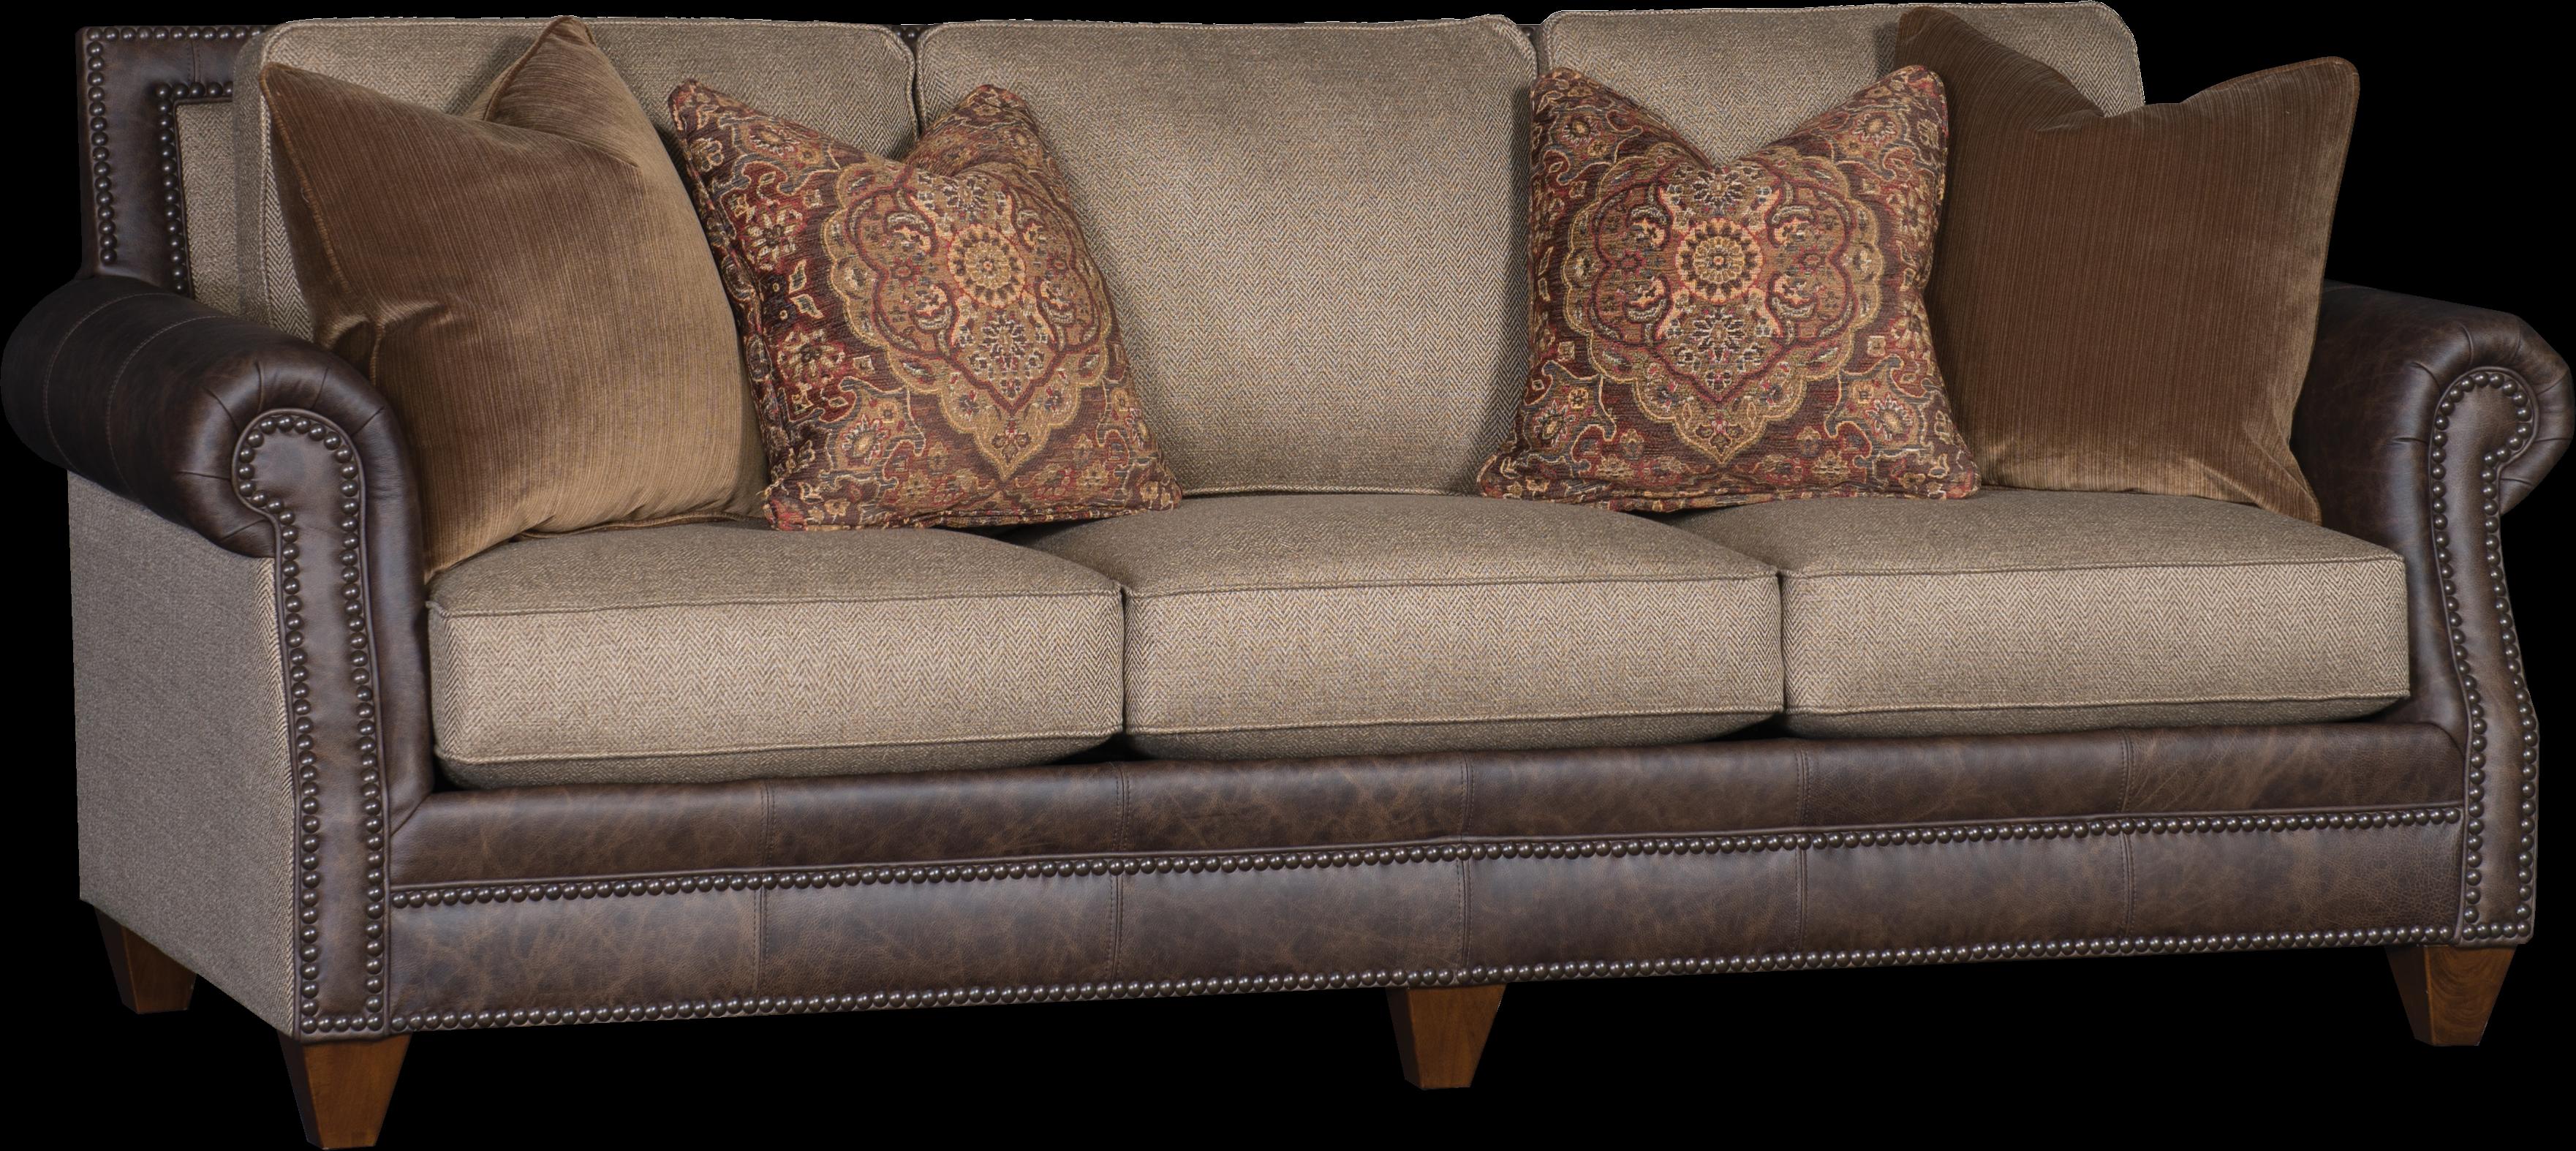 leather fabric sofa bradleyu0027s furniture etc. - mayo leather and fabric sofas VMYRJWJ